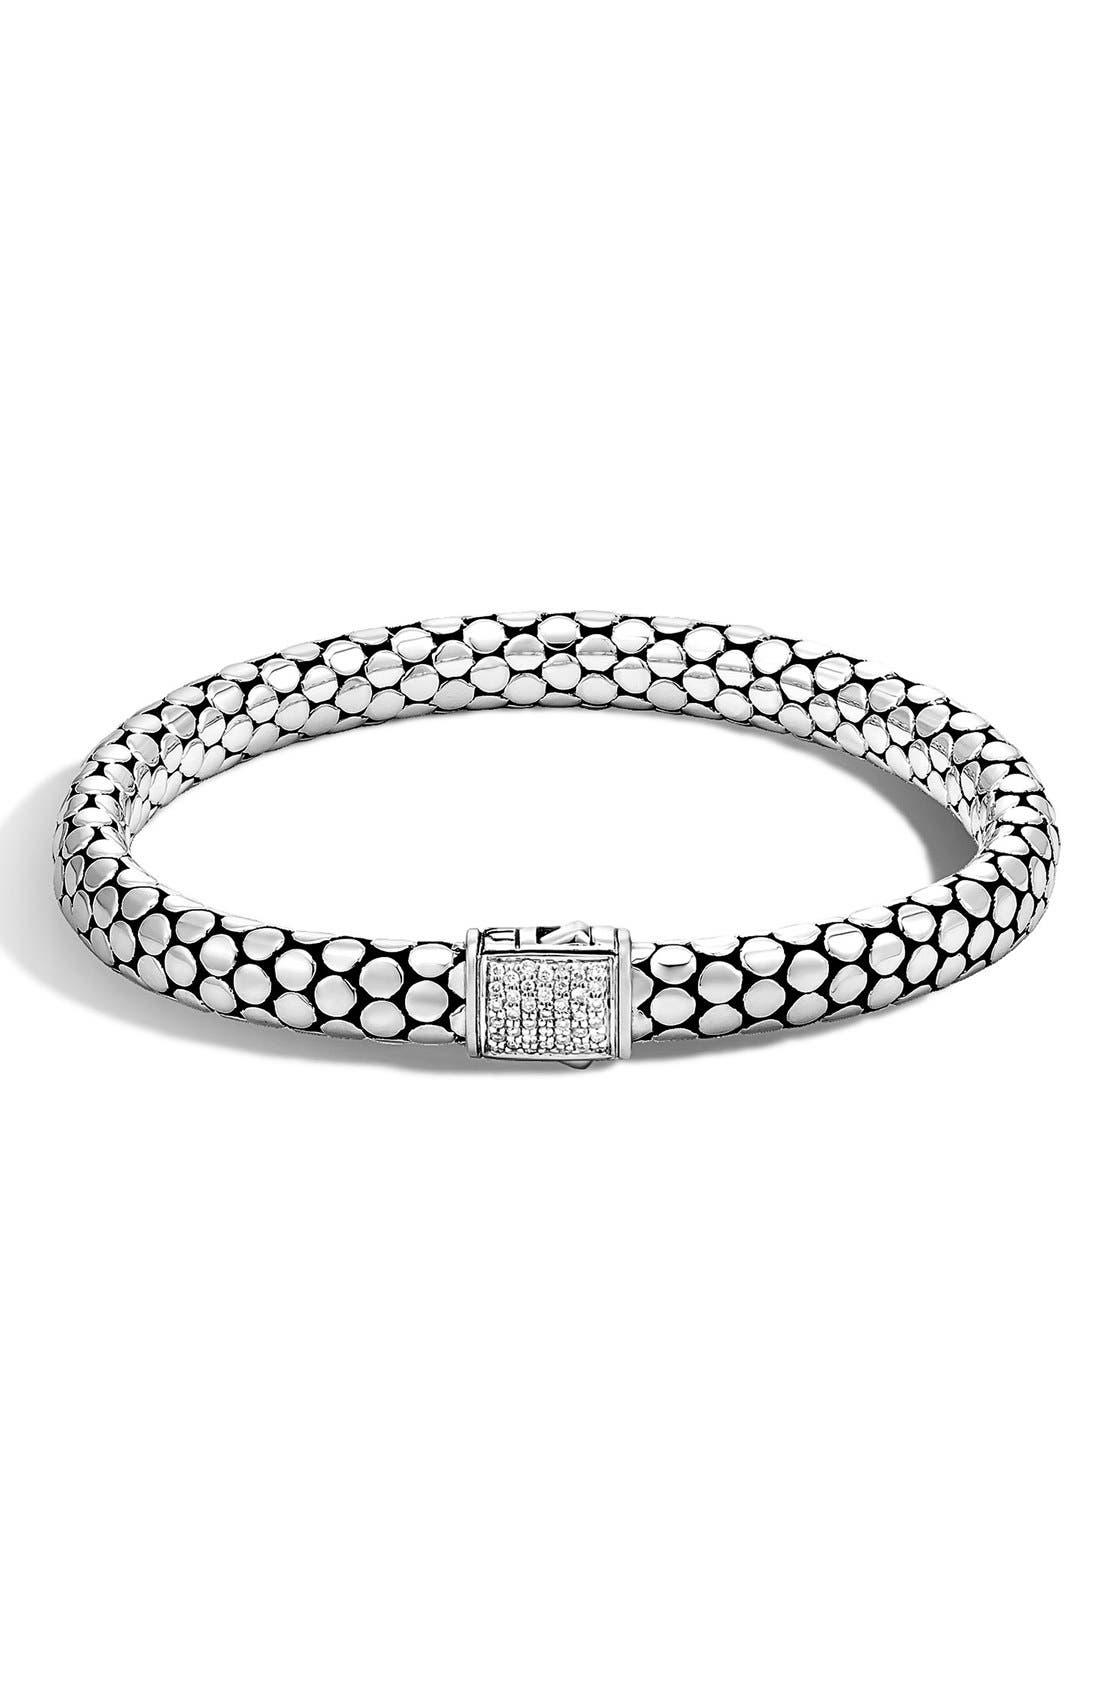 Alternate Image 1 Selected - John Hardy 'Dot' Small Diamond Bracelet